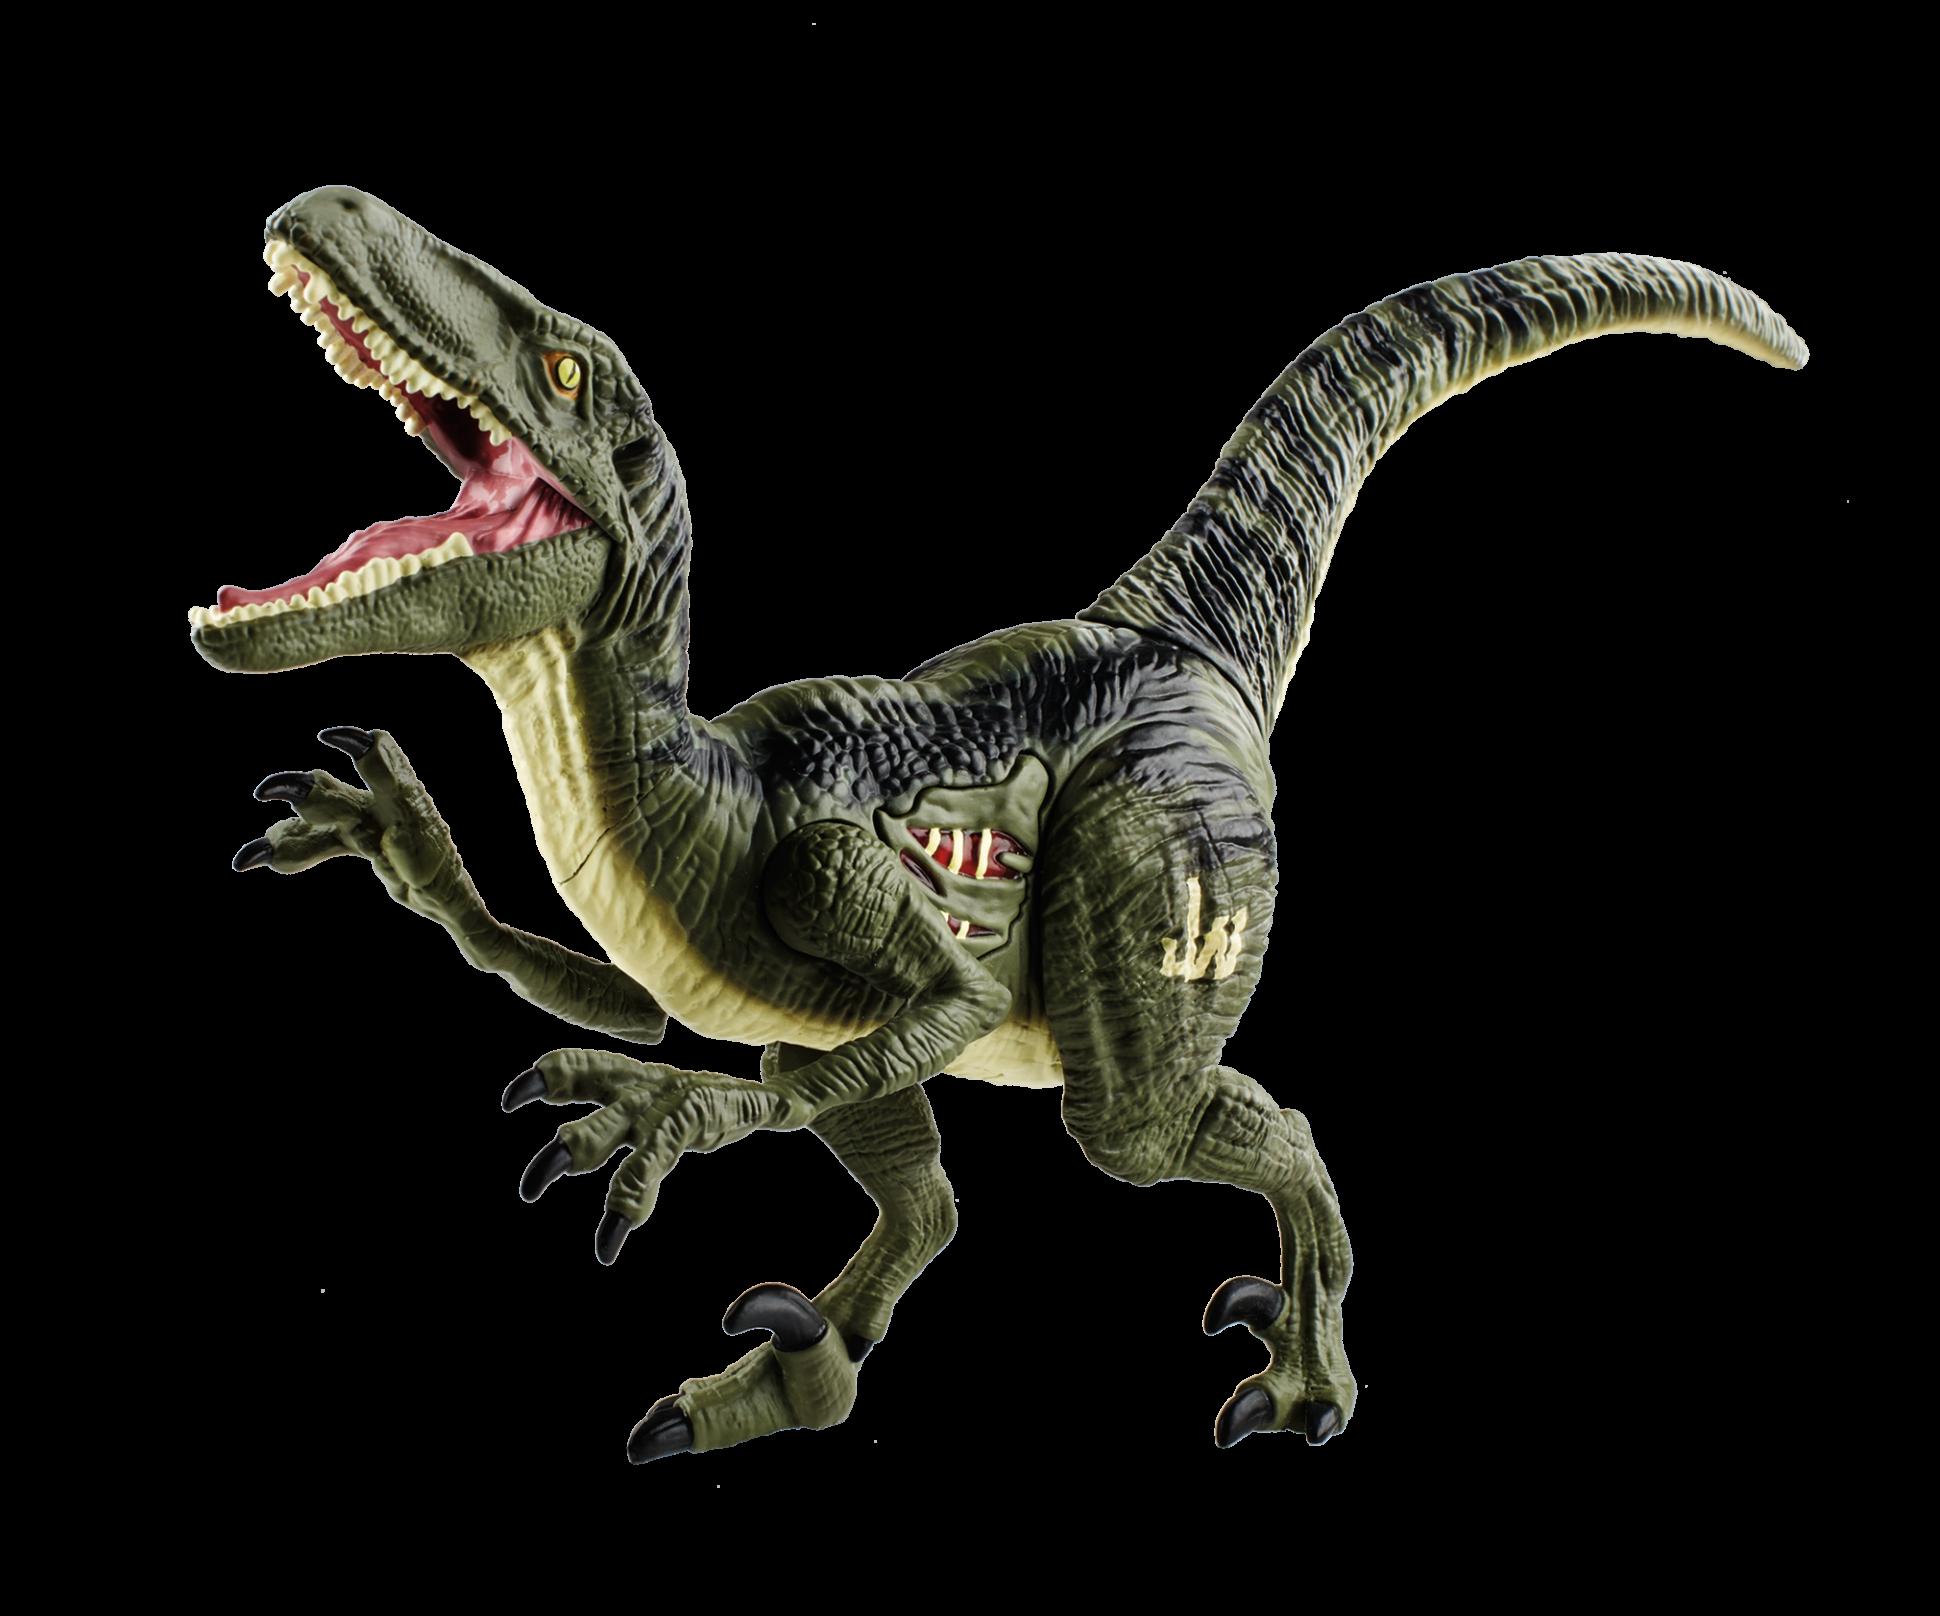 clipart Dinosaur transparent. Png mart